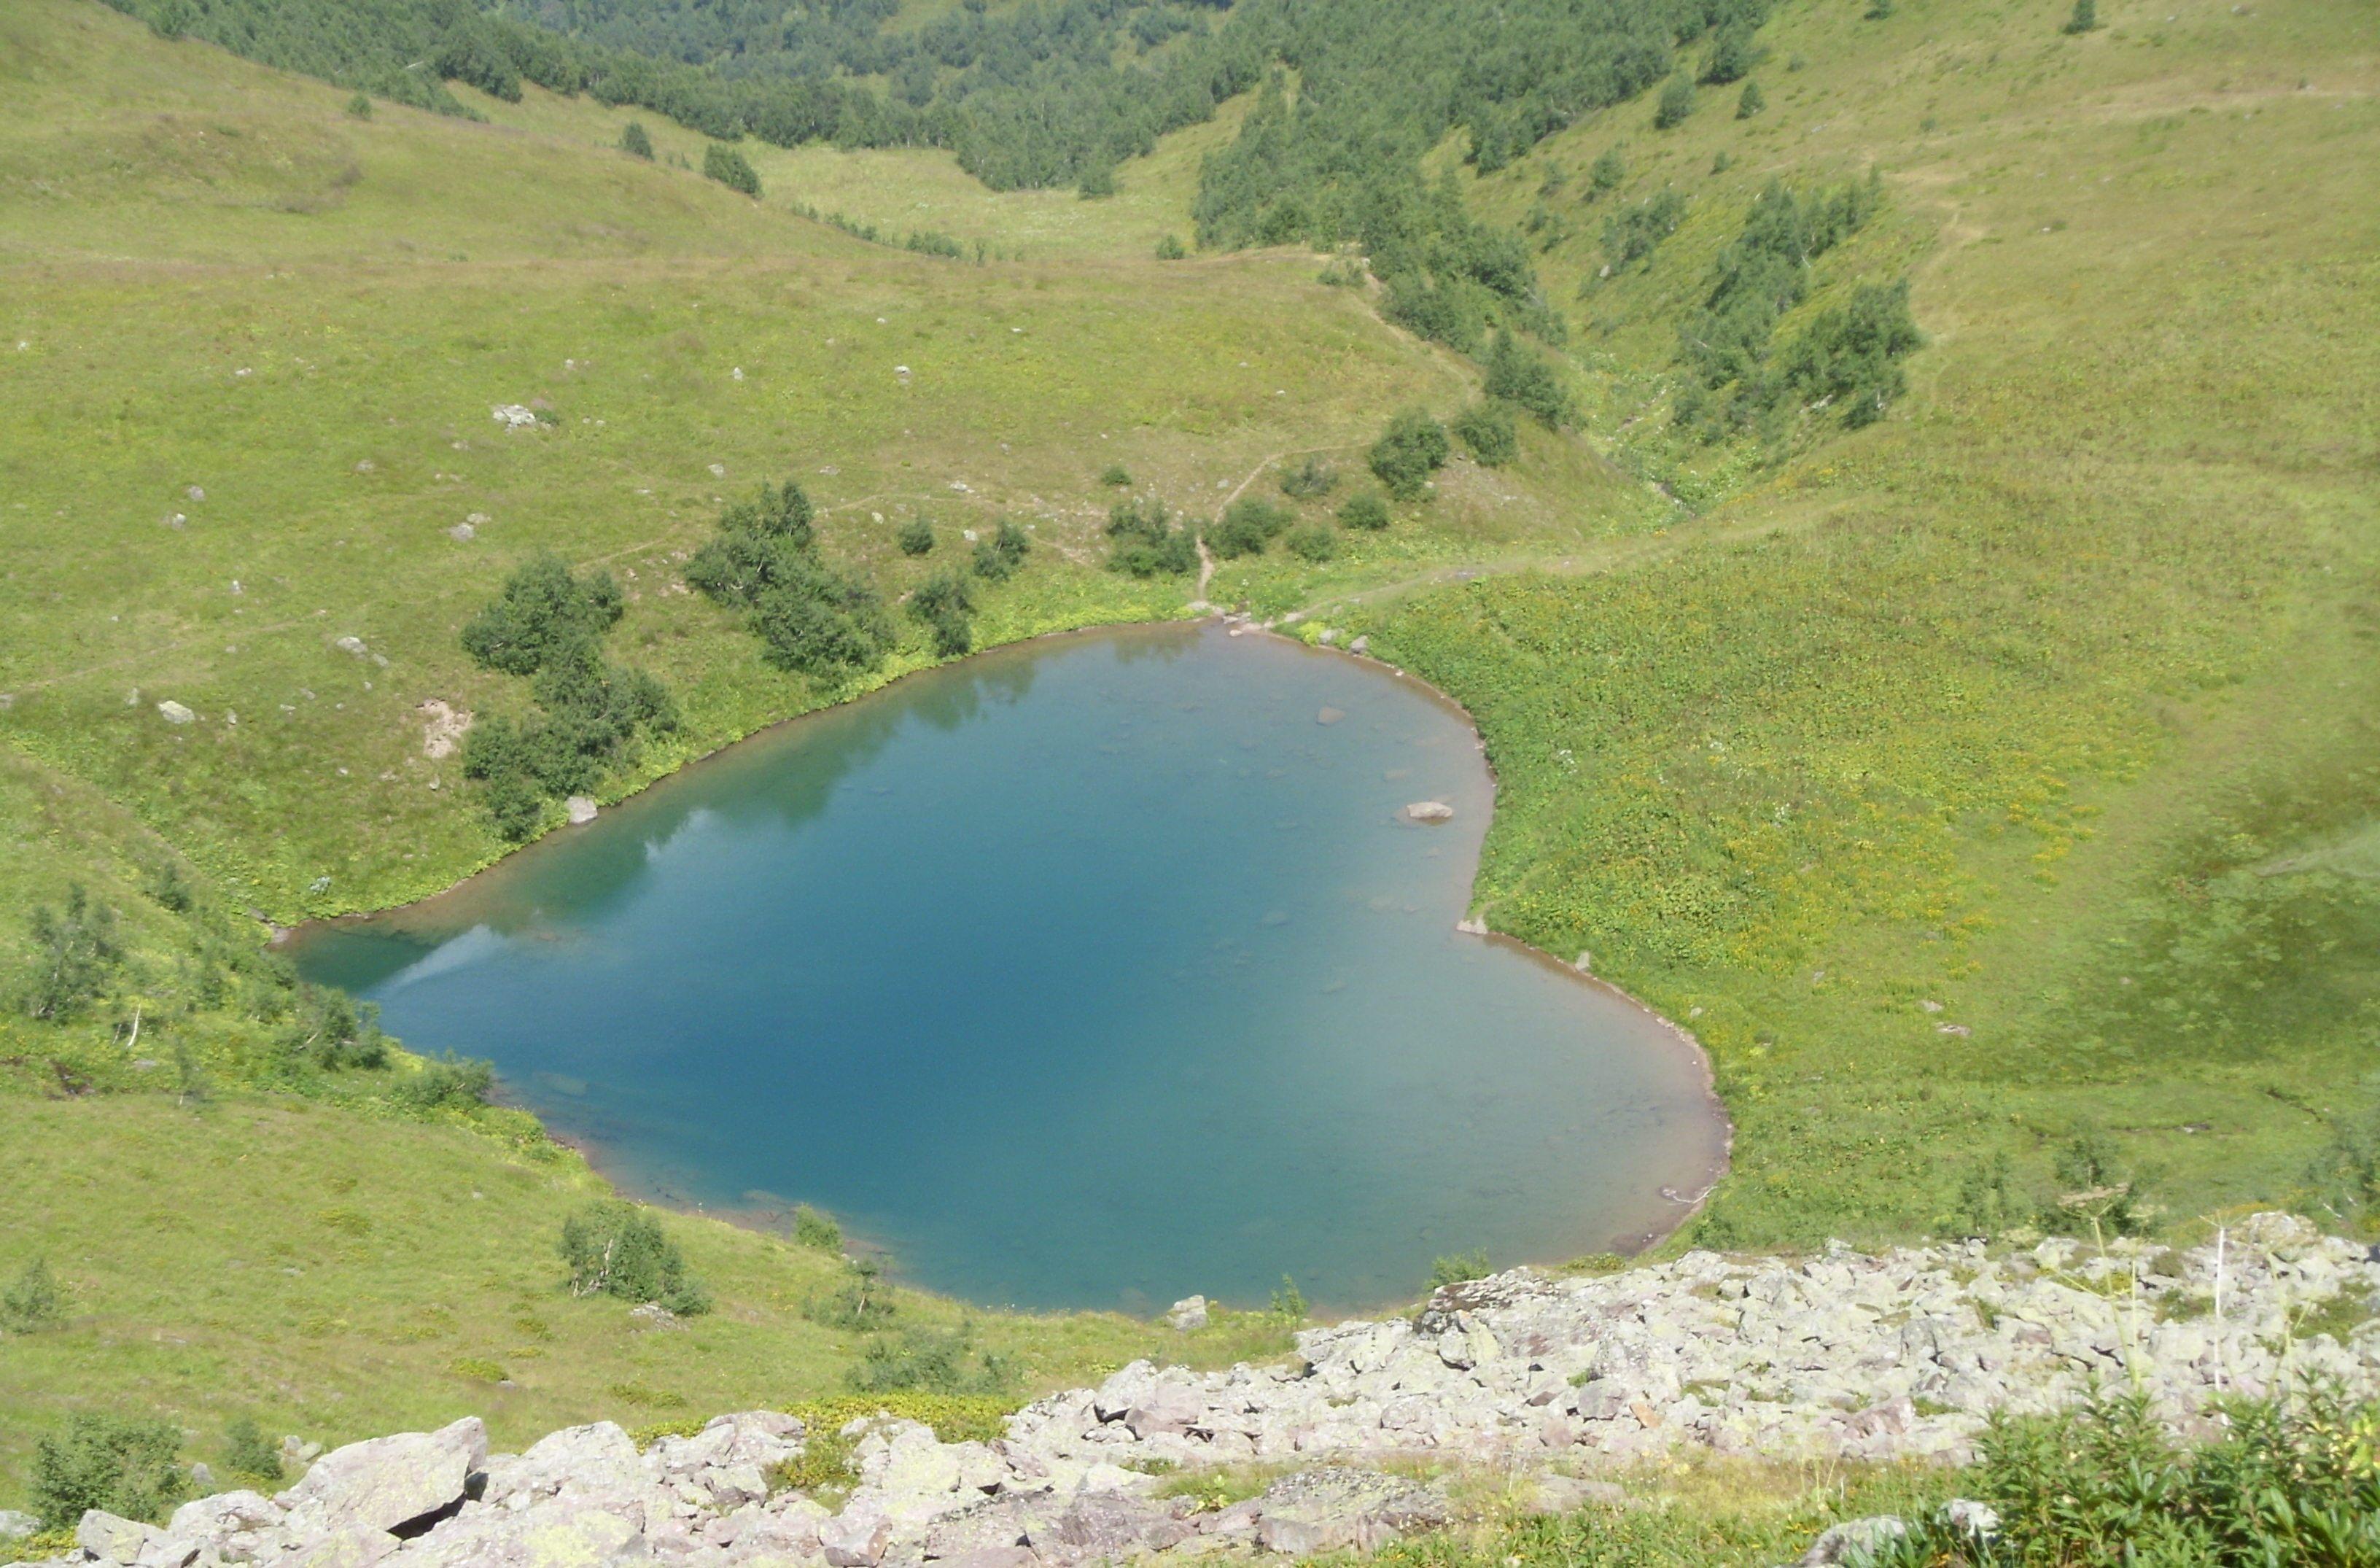 Озеро любви архыз фото 2